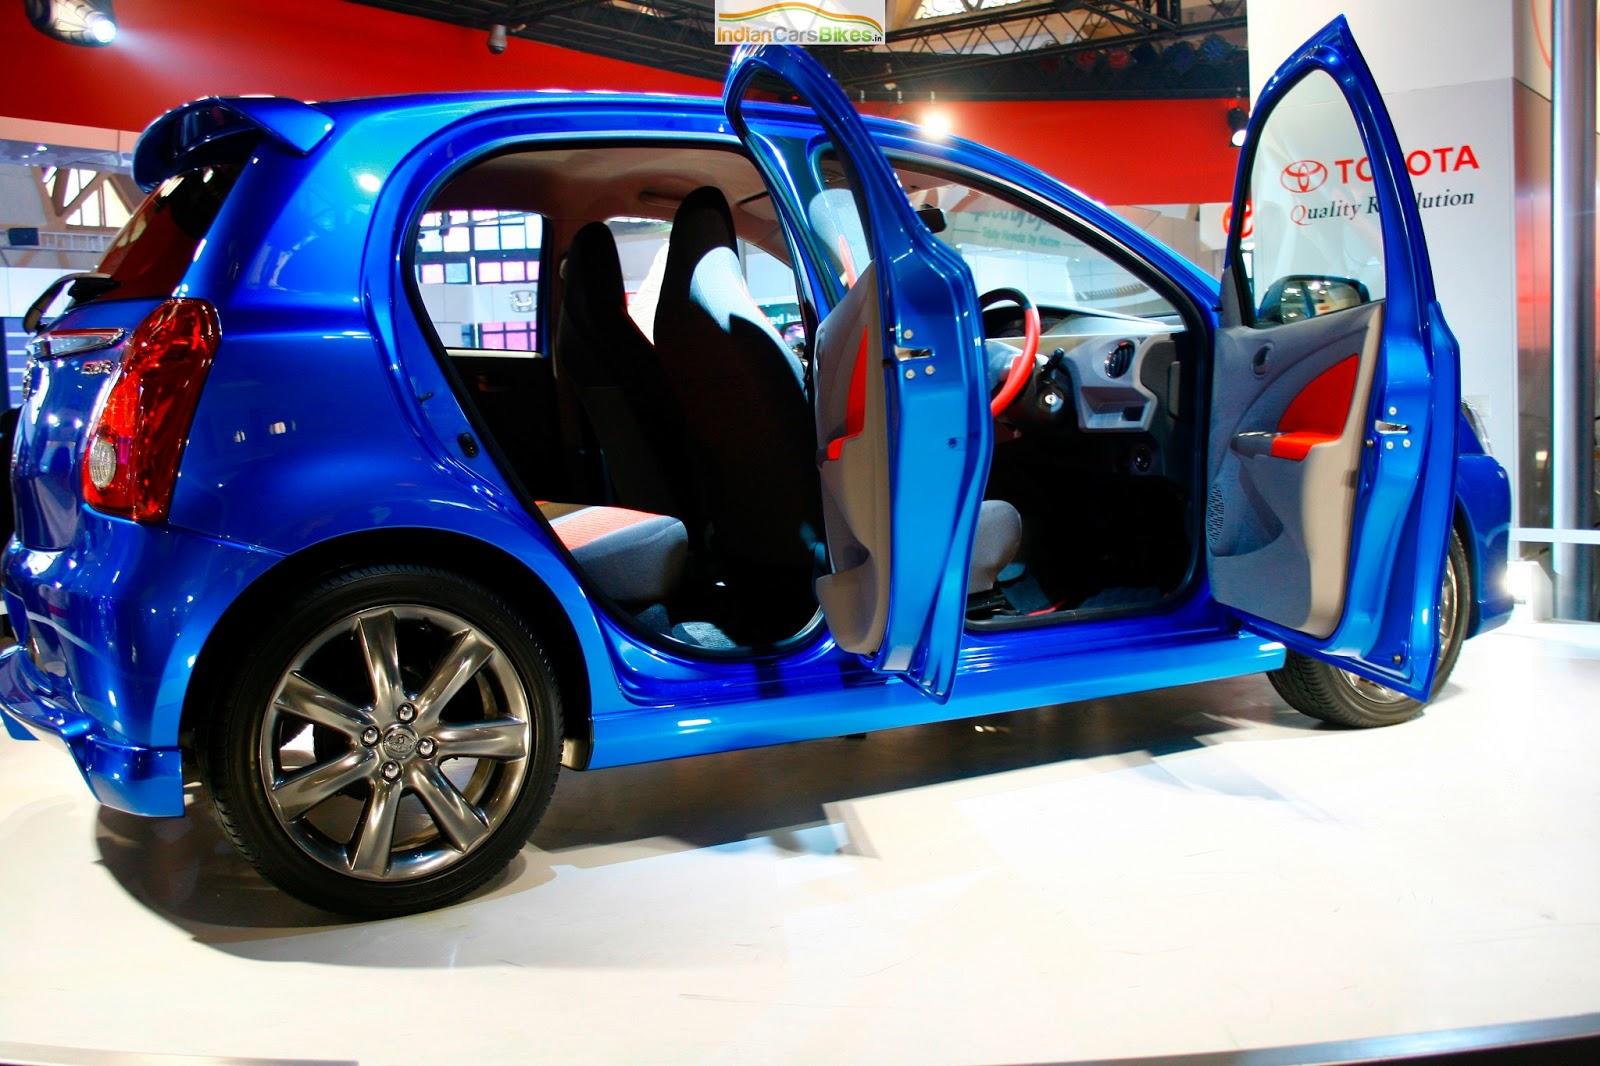 Toyota Etios Car Models